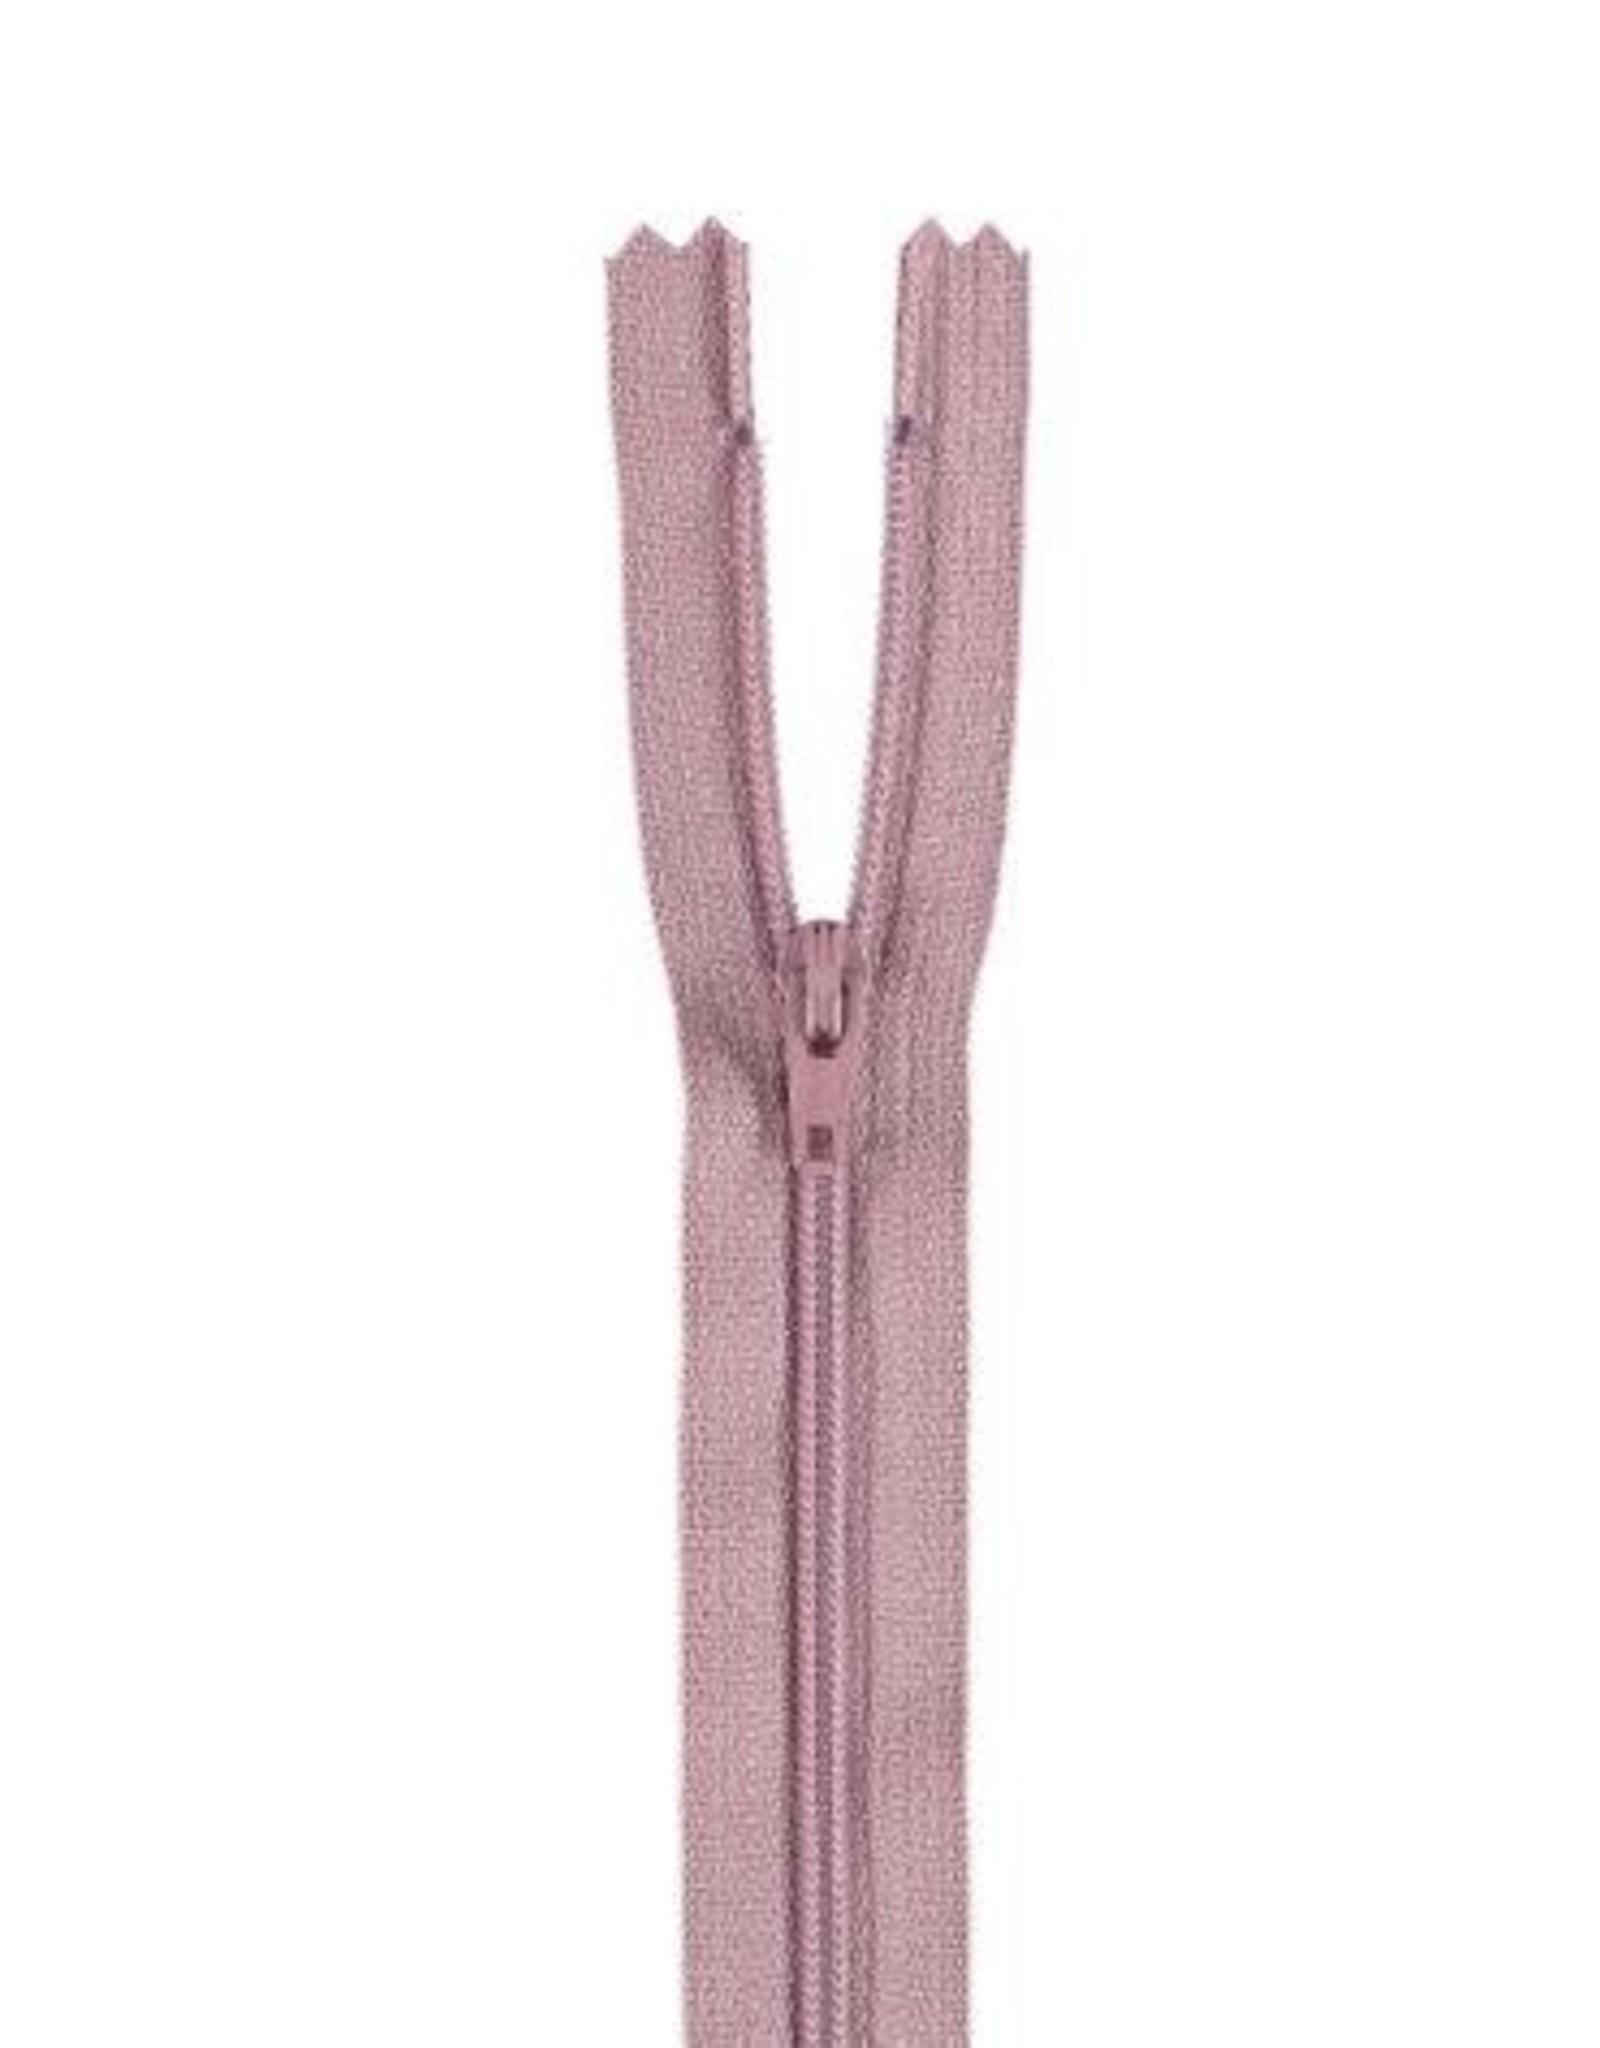 YKK Spiraalrits niet-DB 3mm oud roze 069-55cm